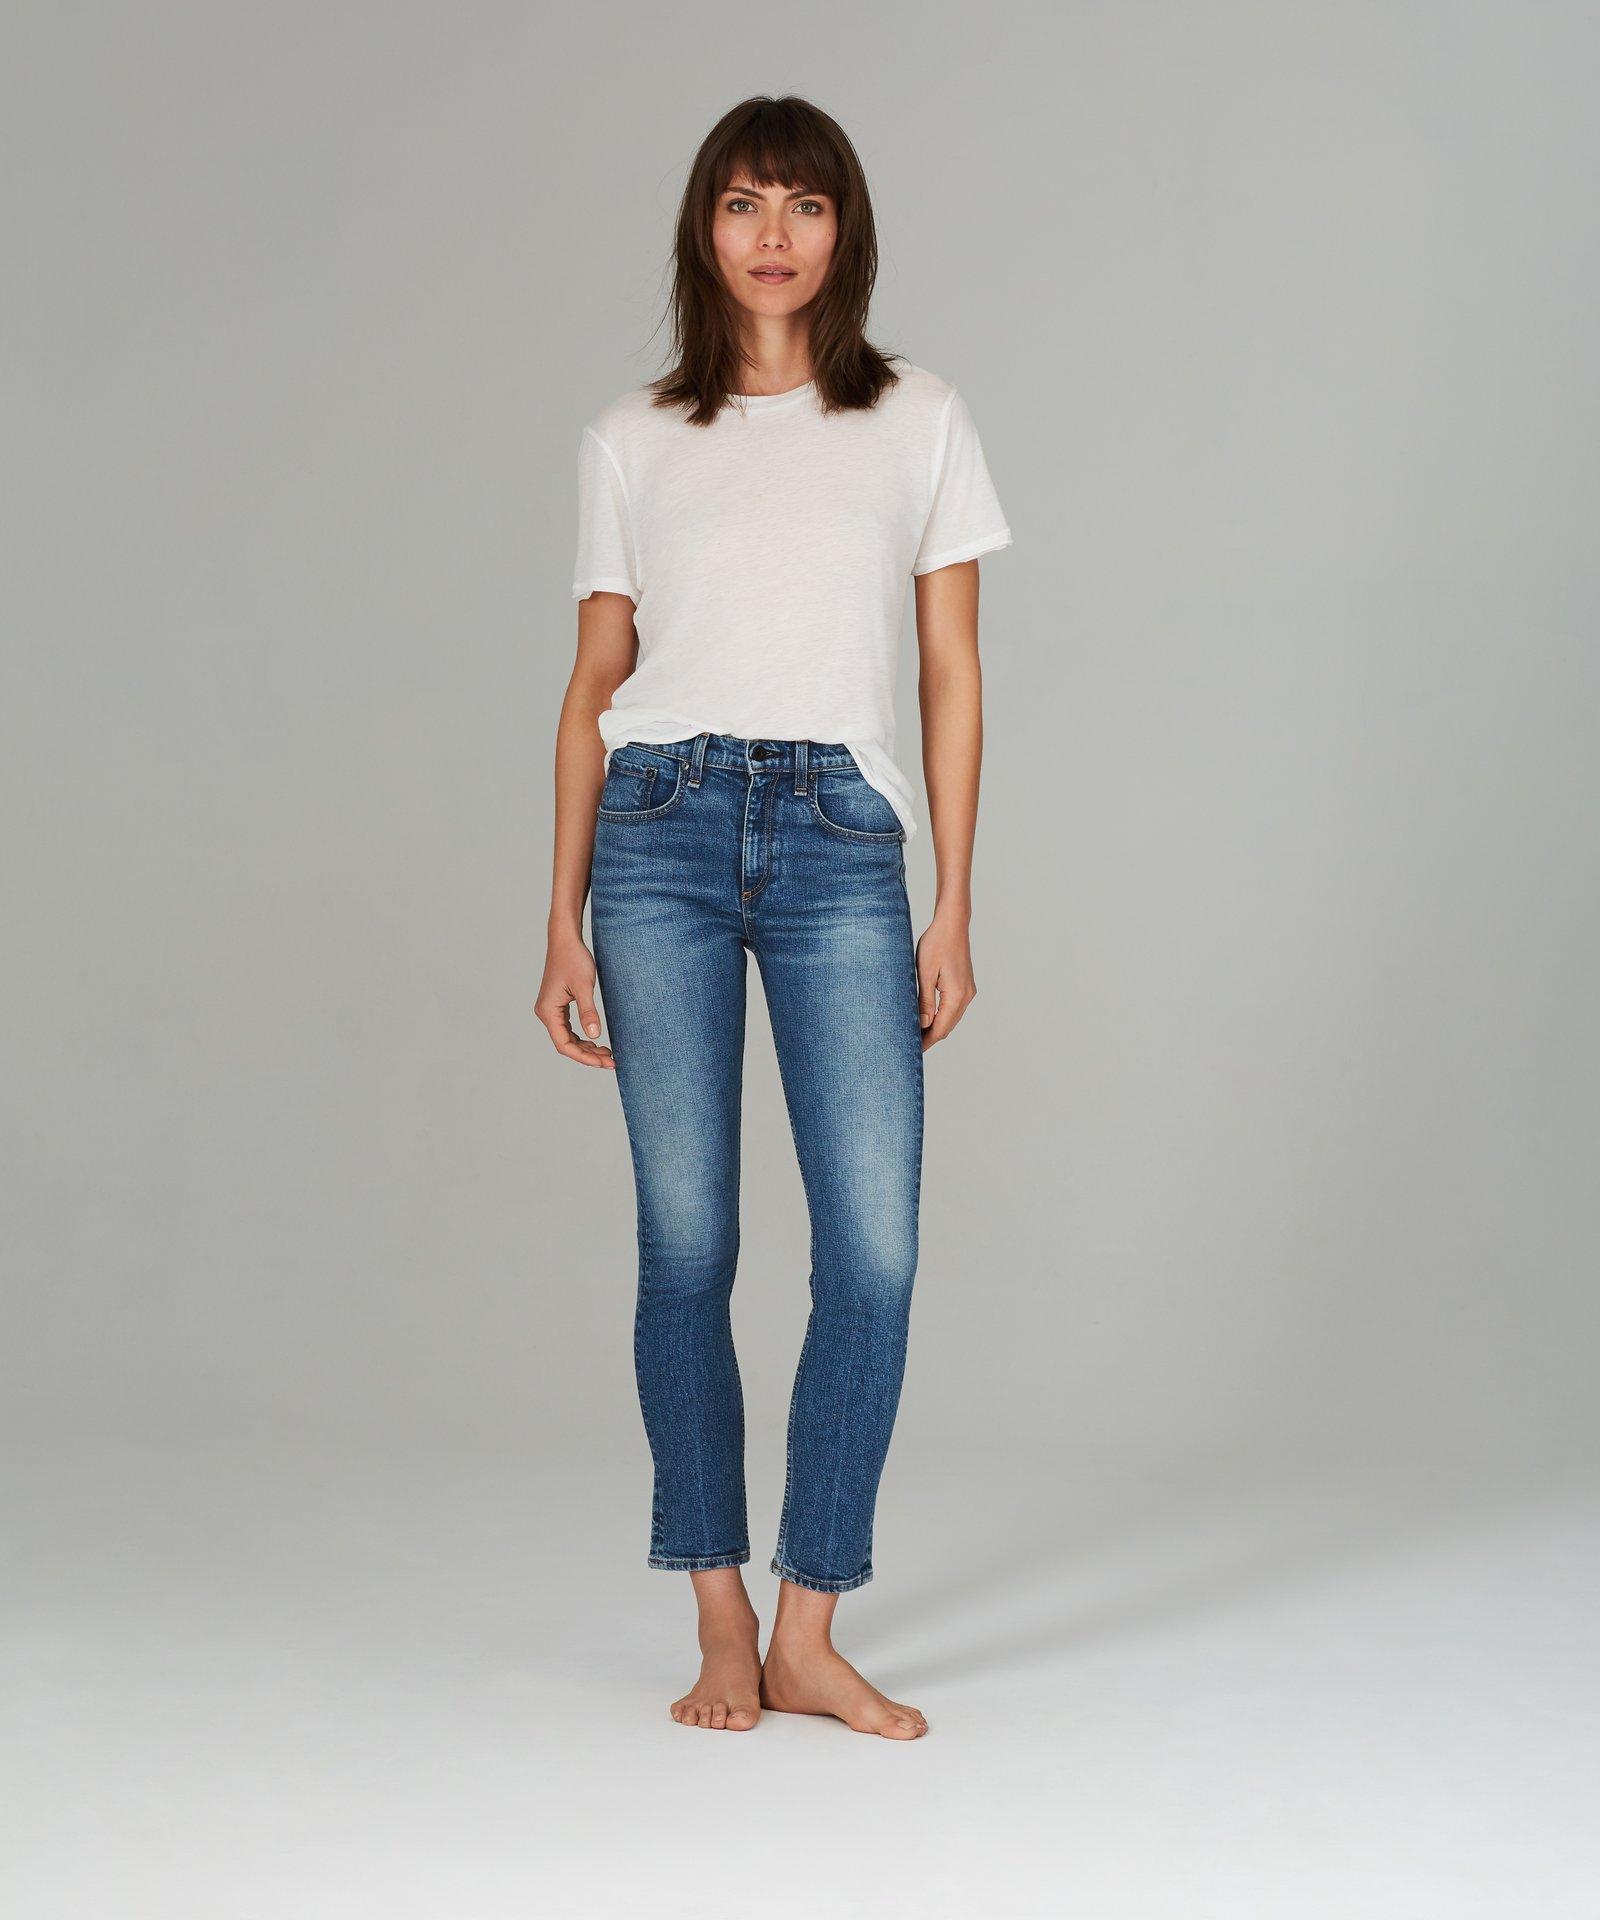 cropped jeans, skinny jeans, denim, medium wash, high rise, askk ny